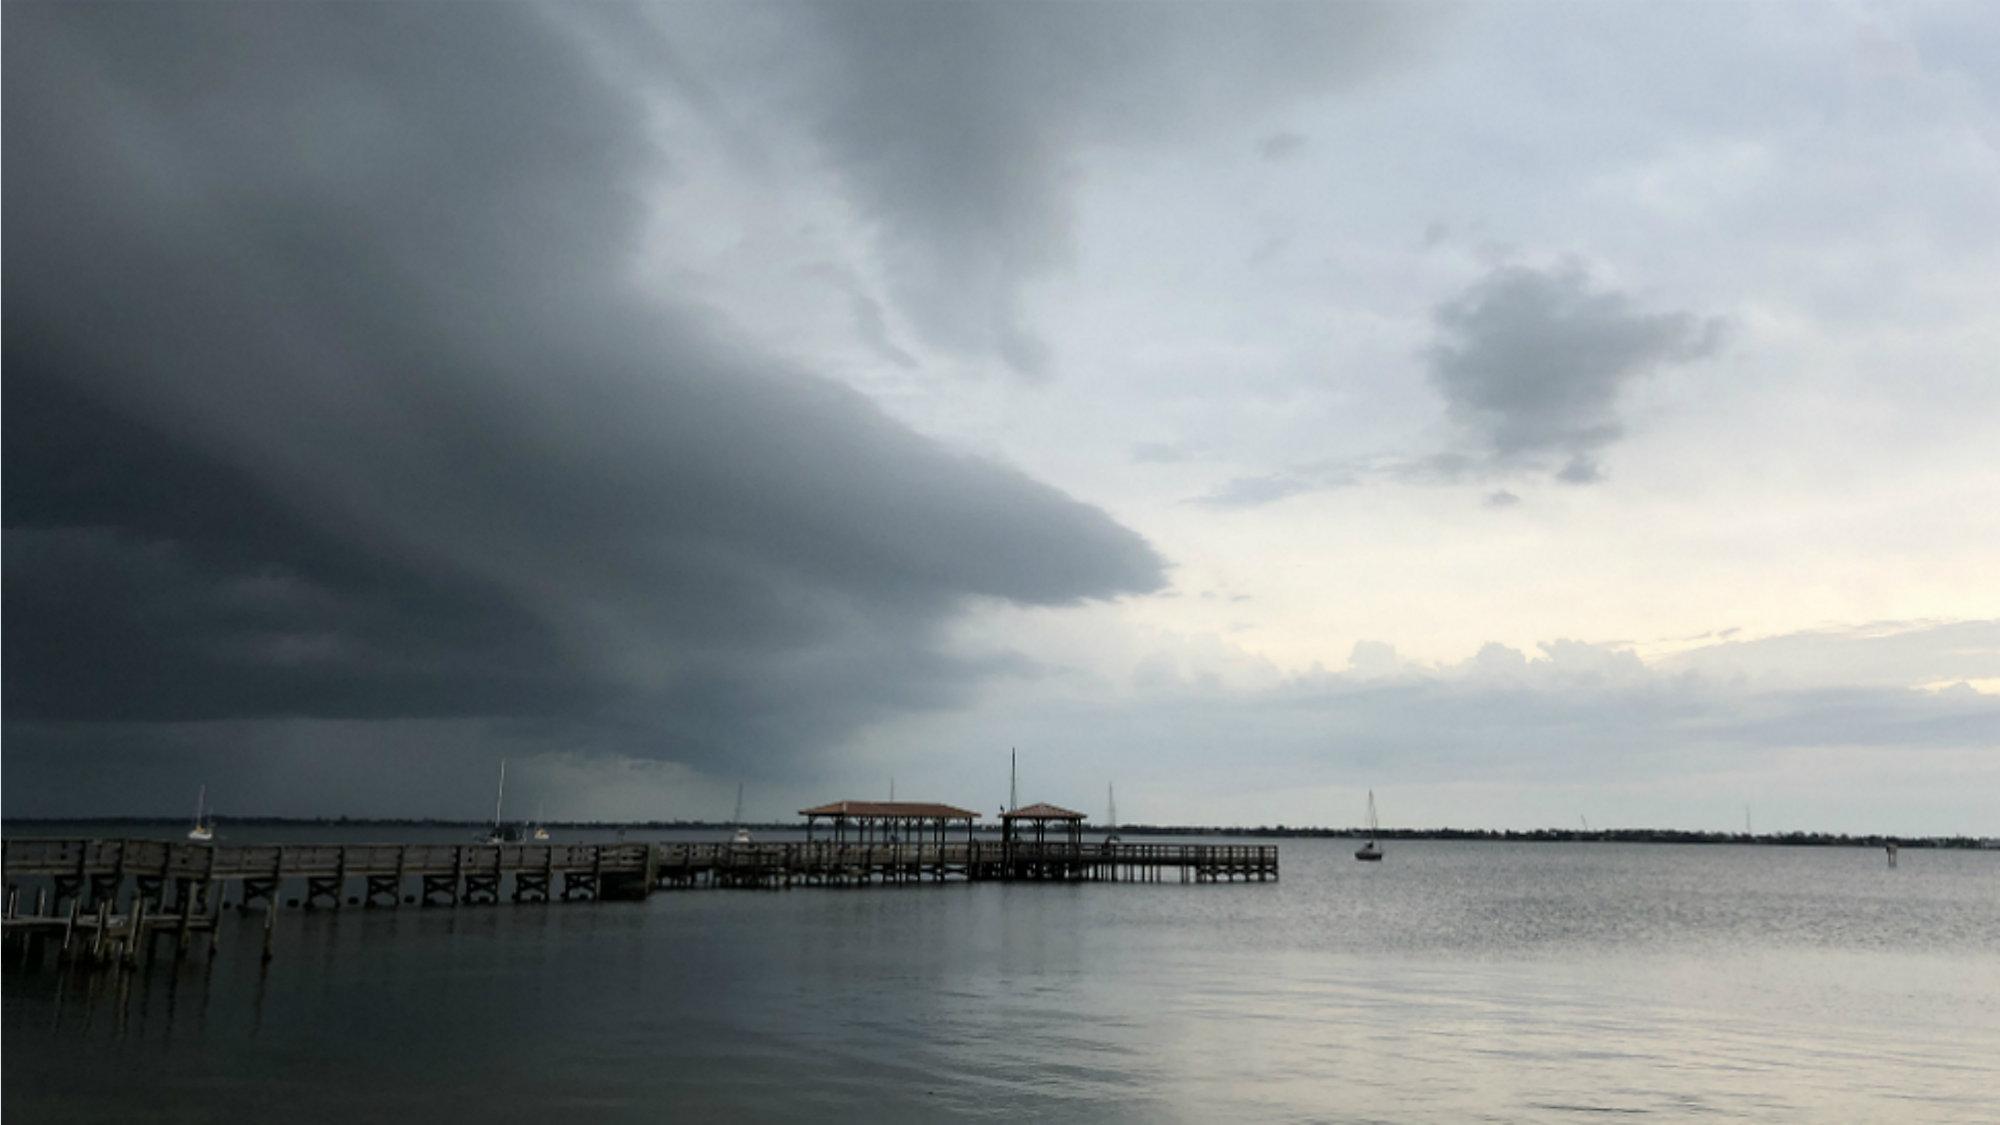 Orlando-Area Severe Weather: Storms Halt Airport Flights